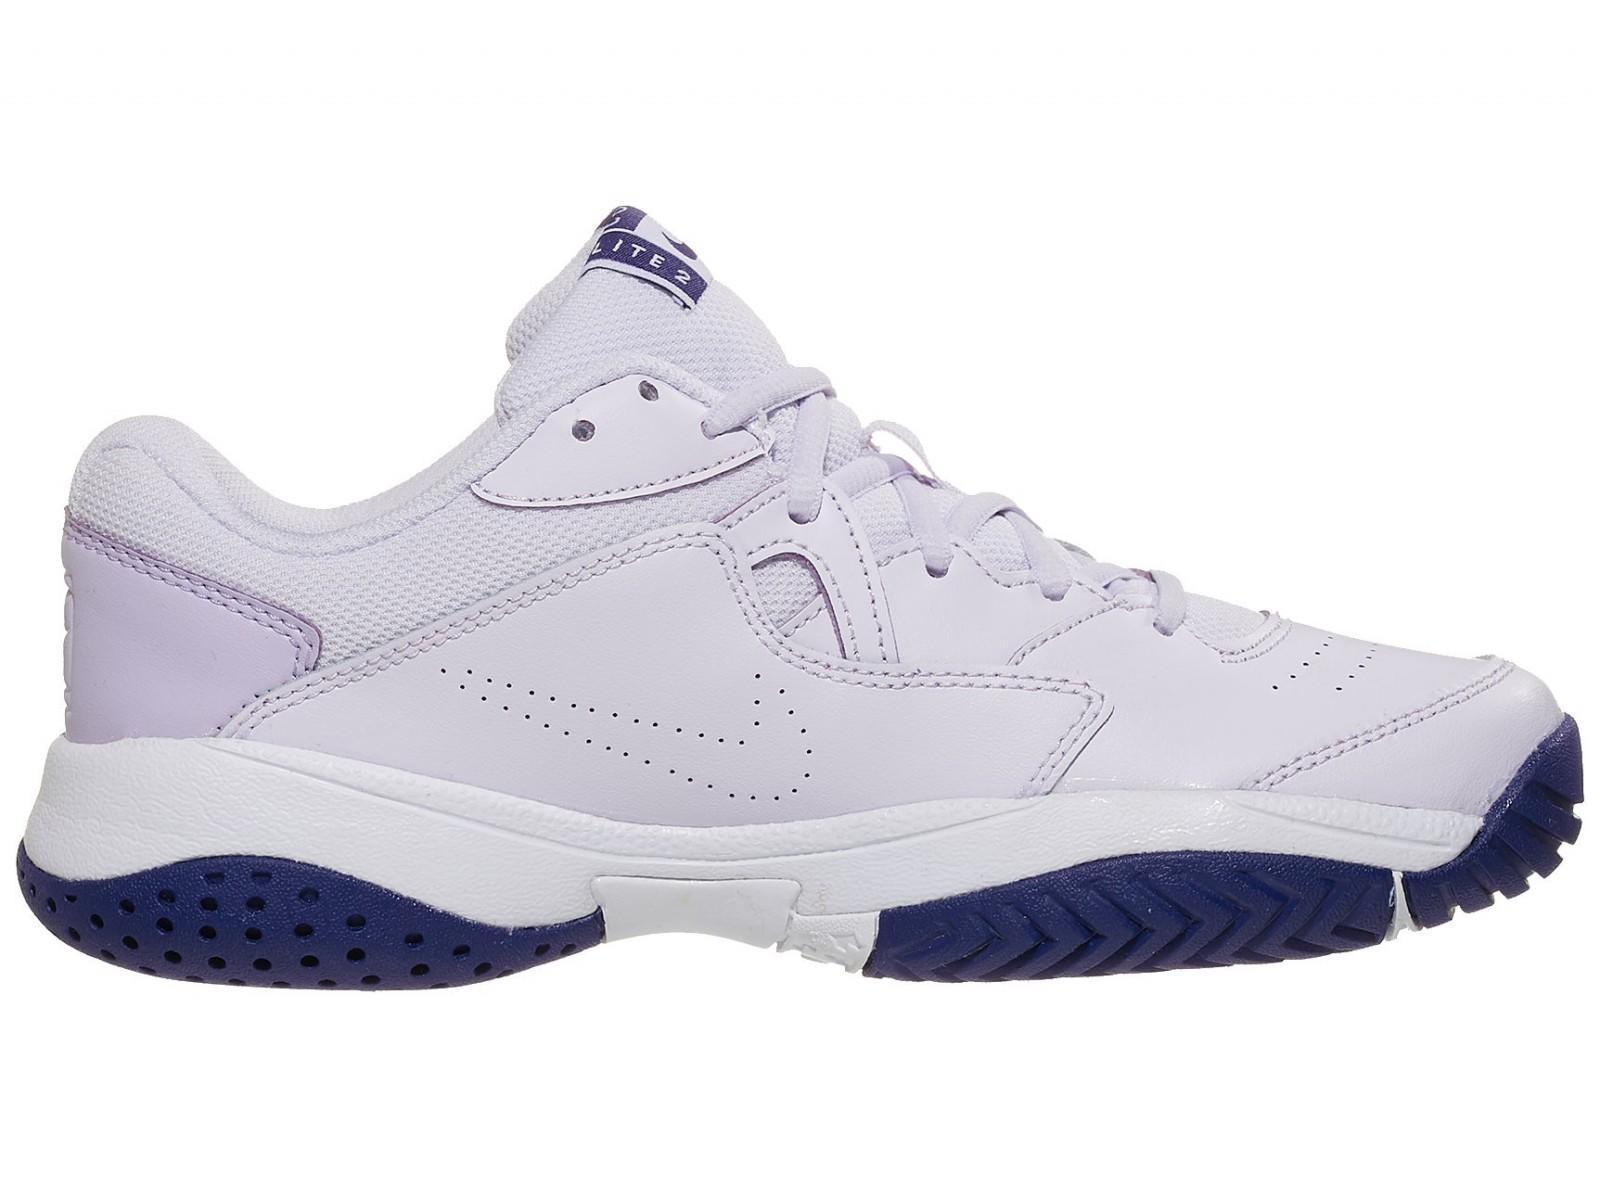 Теннисные кроссовки женские Nike Court Lite 2 barely grape/violet mist/white/regency purple